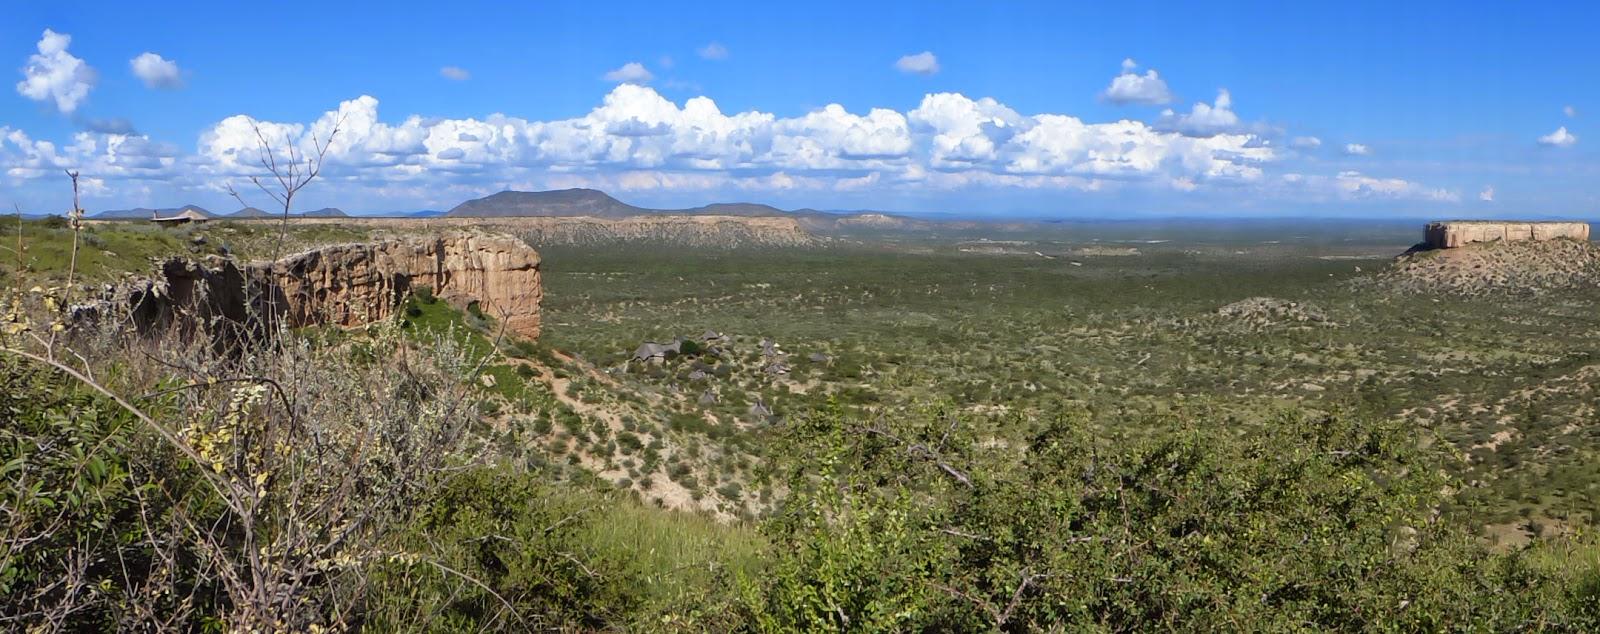 Vingerklip Lodge Namibia